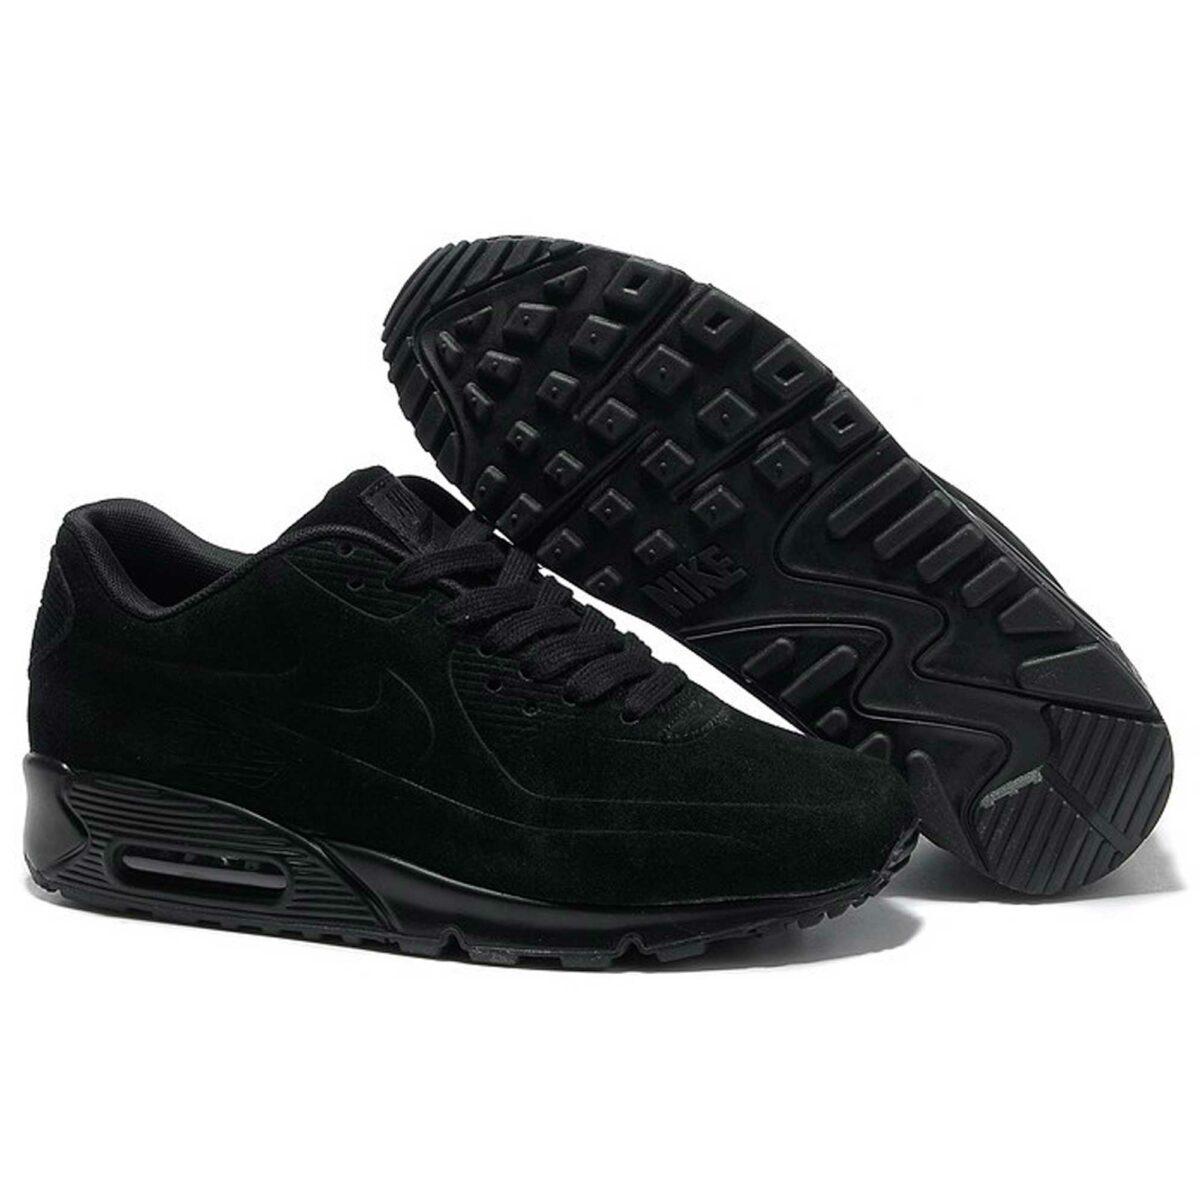 nike air max 90 VT black купить